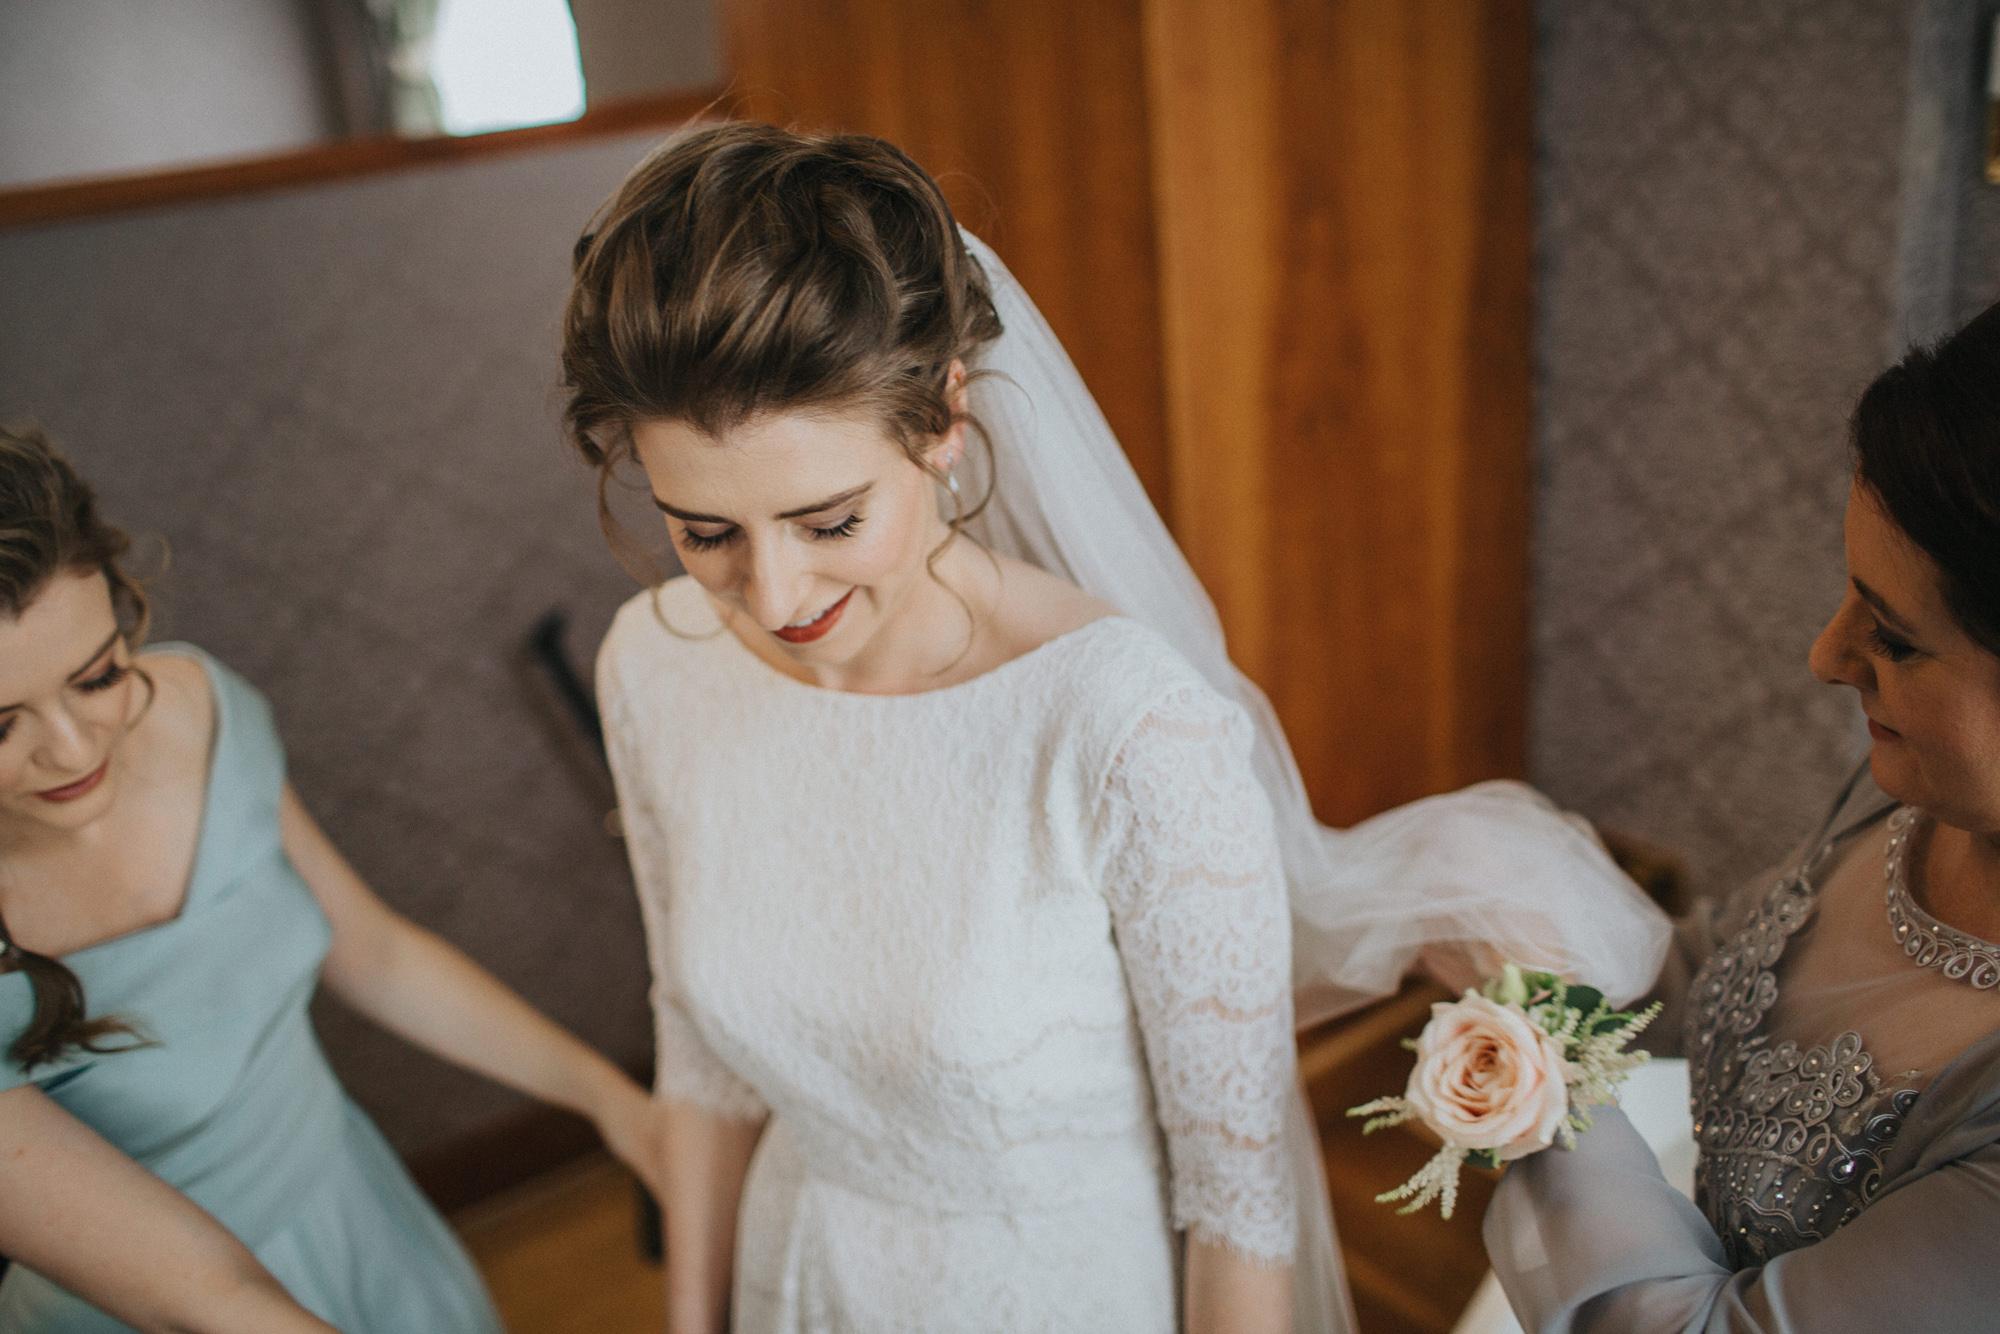 Kate-Beaumont-Lace-Flared-Dahlia-Gown-Leeds-Wedding-Bloom-Weddings-4.jpg